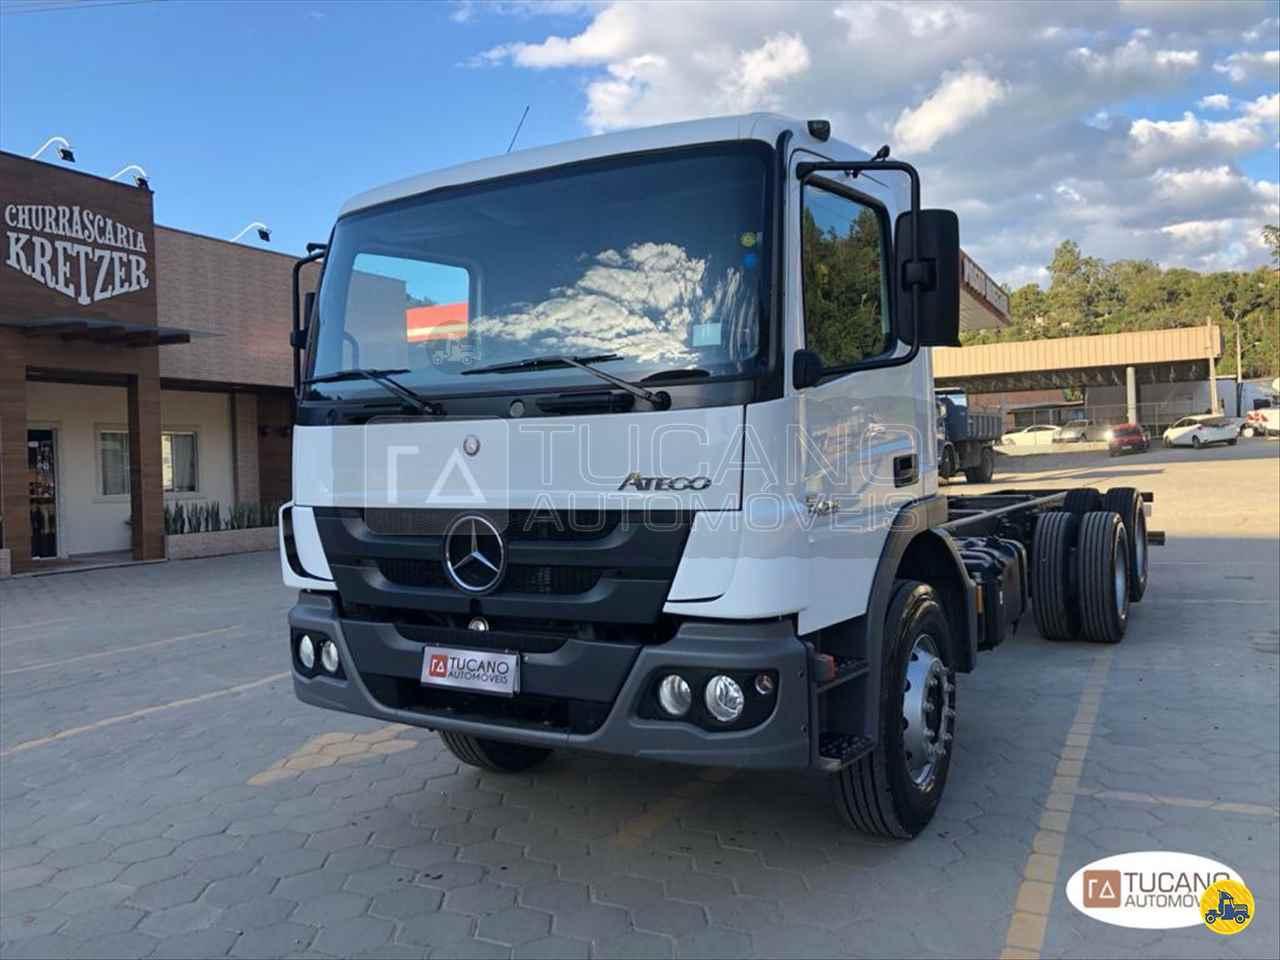 CAMINHAO MERCEDES-BENZ MB 2426 Chassis Truck 6x2 Tucano Automóveis ALFREDO WAGNER SANTA CATARINA SC